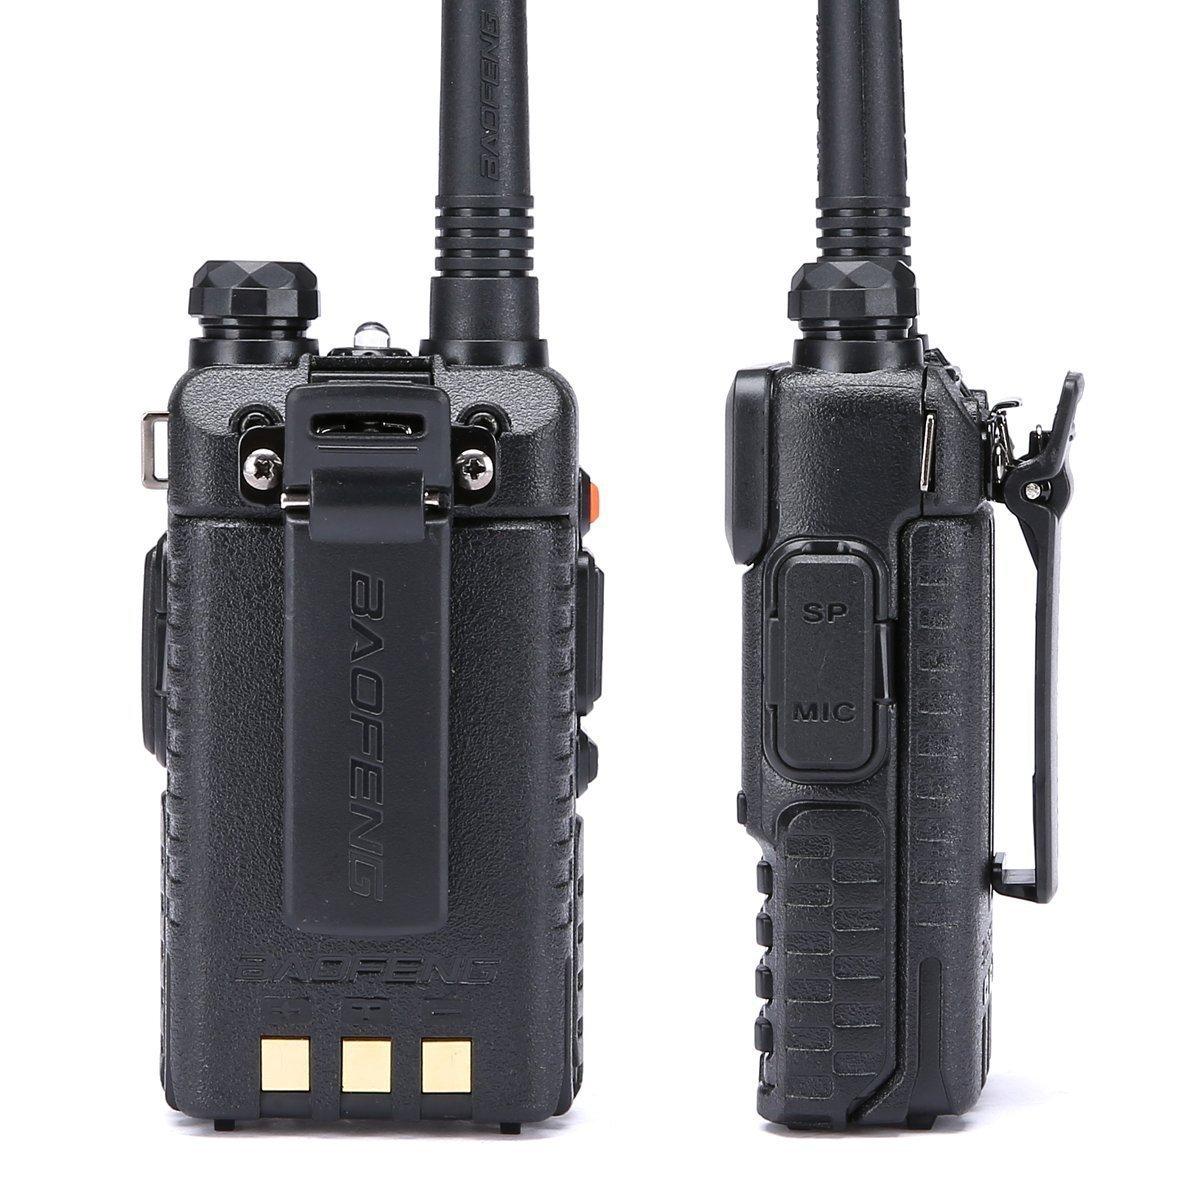 12 1800mah Batteries BaoFeng Radio UV-5R Dual Band Two Way Radio 6 Pack 1 Programming Cable Baofeng Walkie Talkie Ham Radio + 6 NA-771 Antennas and Speaker Mics